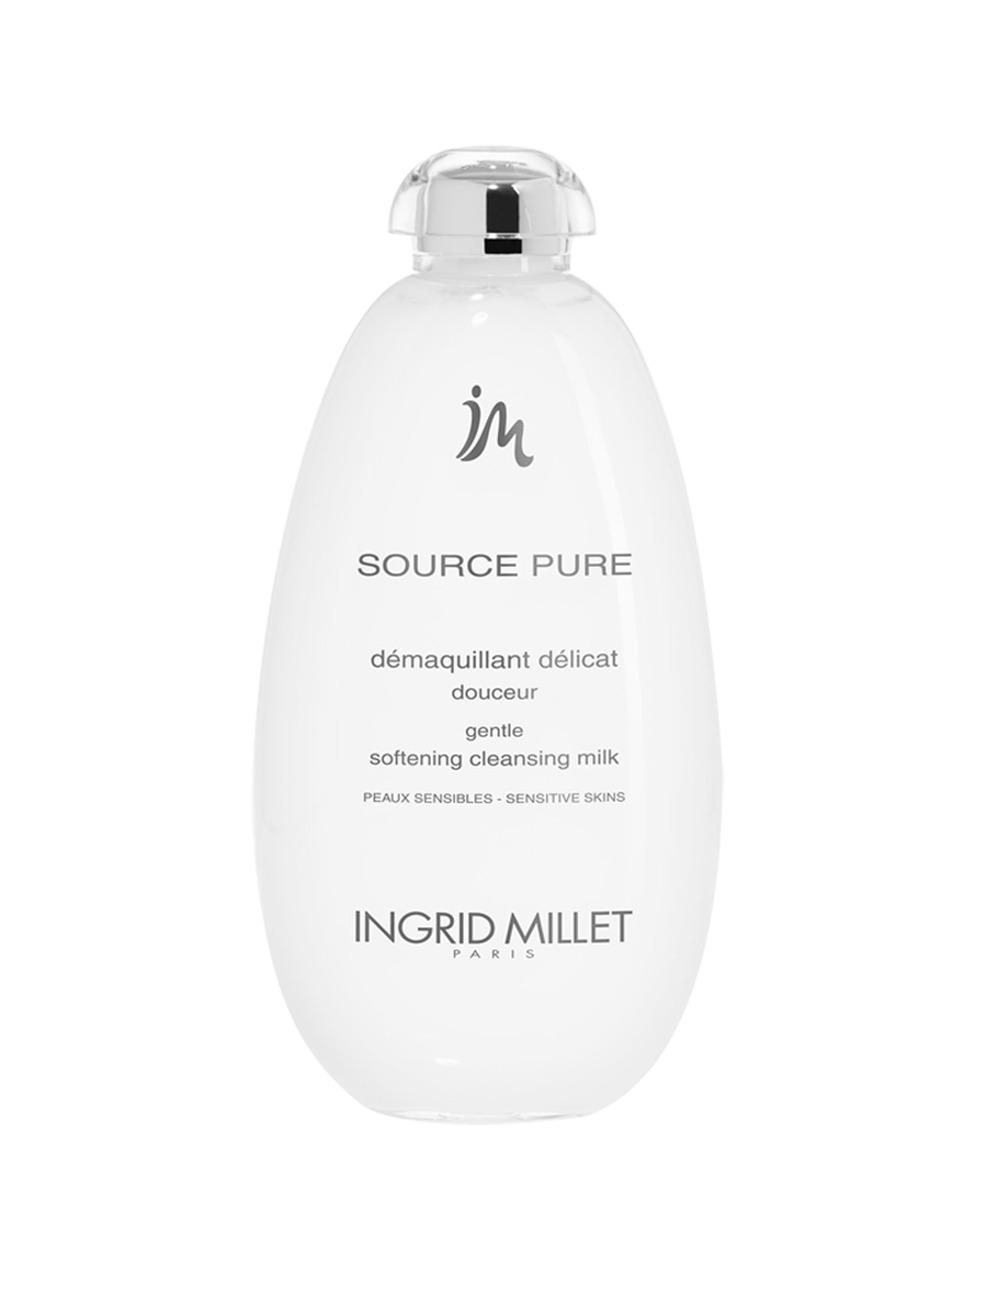 2-Demaquillant-Delicate-Latte-detergente-super-delicato-Ingrid-Millet-Linea-cosmetici-di-lusso-Source-Pure-Dispar-SpA.jpg